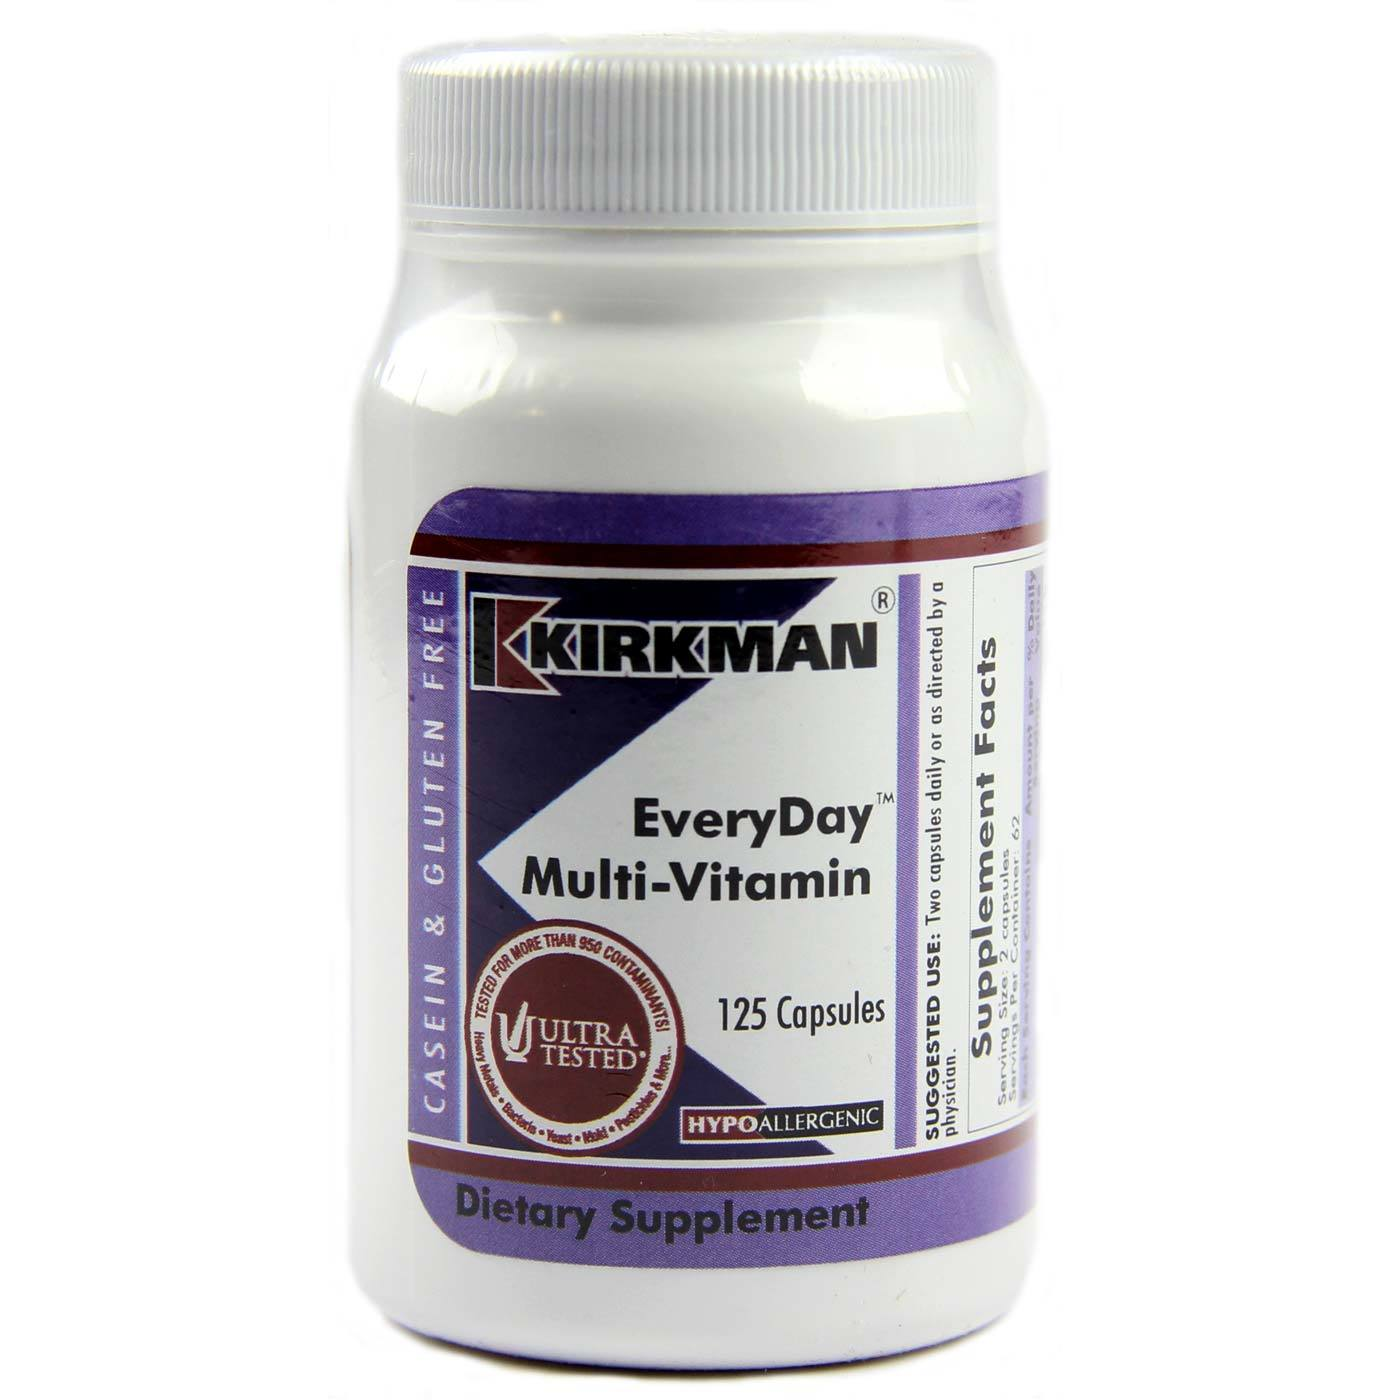 Kirkman Labs Everyday Multi Vitamin Hypoallergenic 125